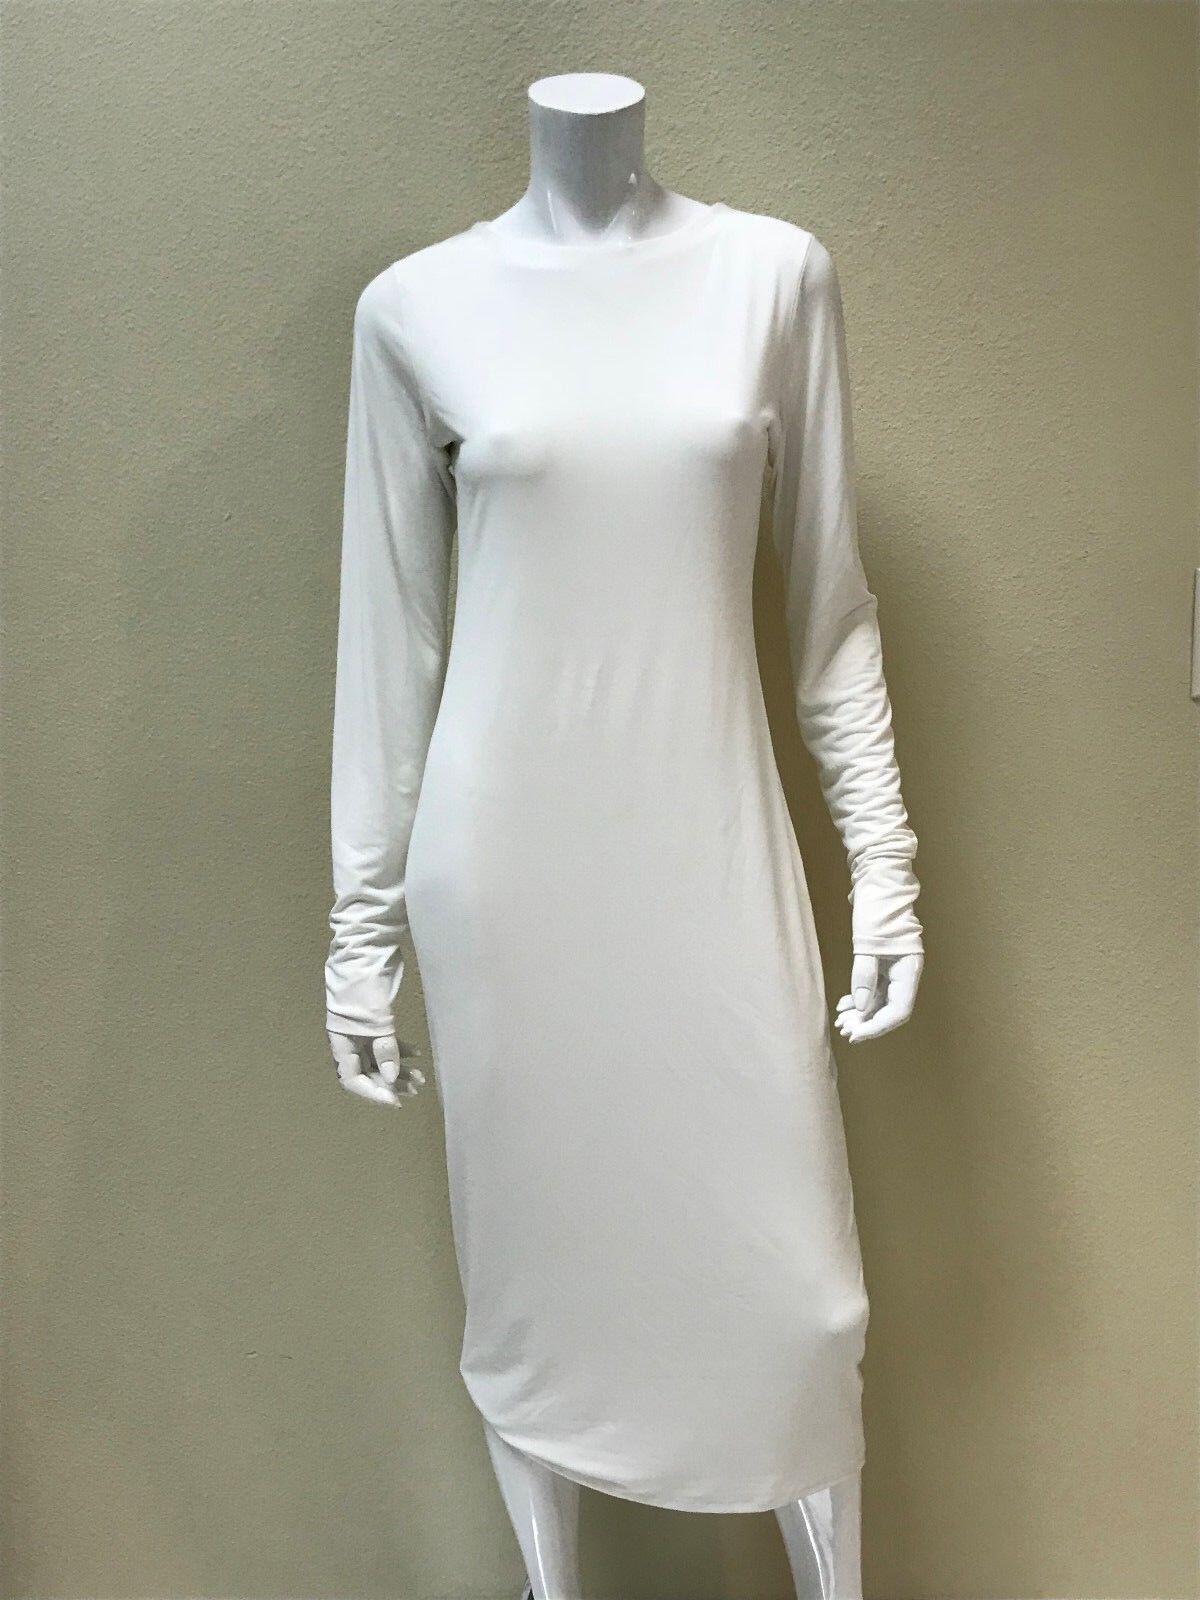 EVA VARRO  Women's Solid White Long Sleeved Sheath Midi Dress Size Medium NEW